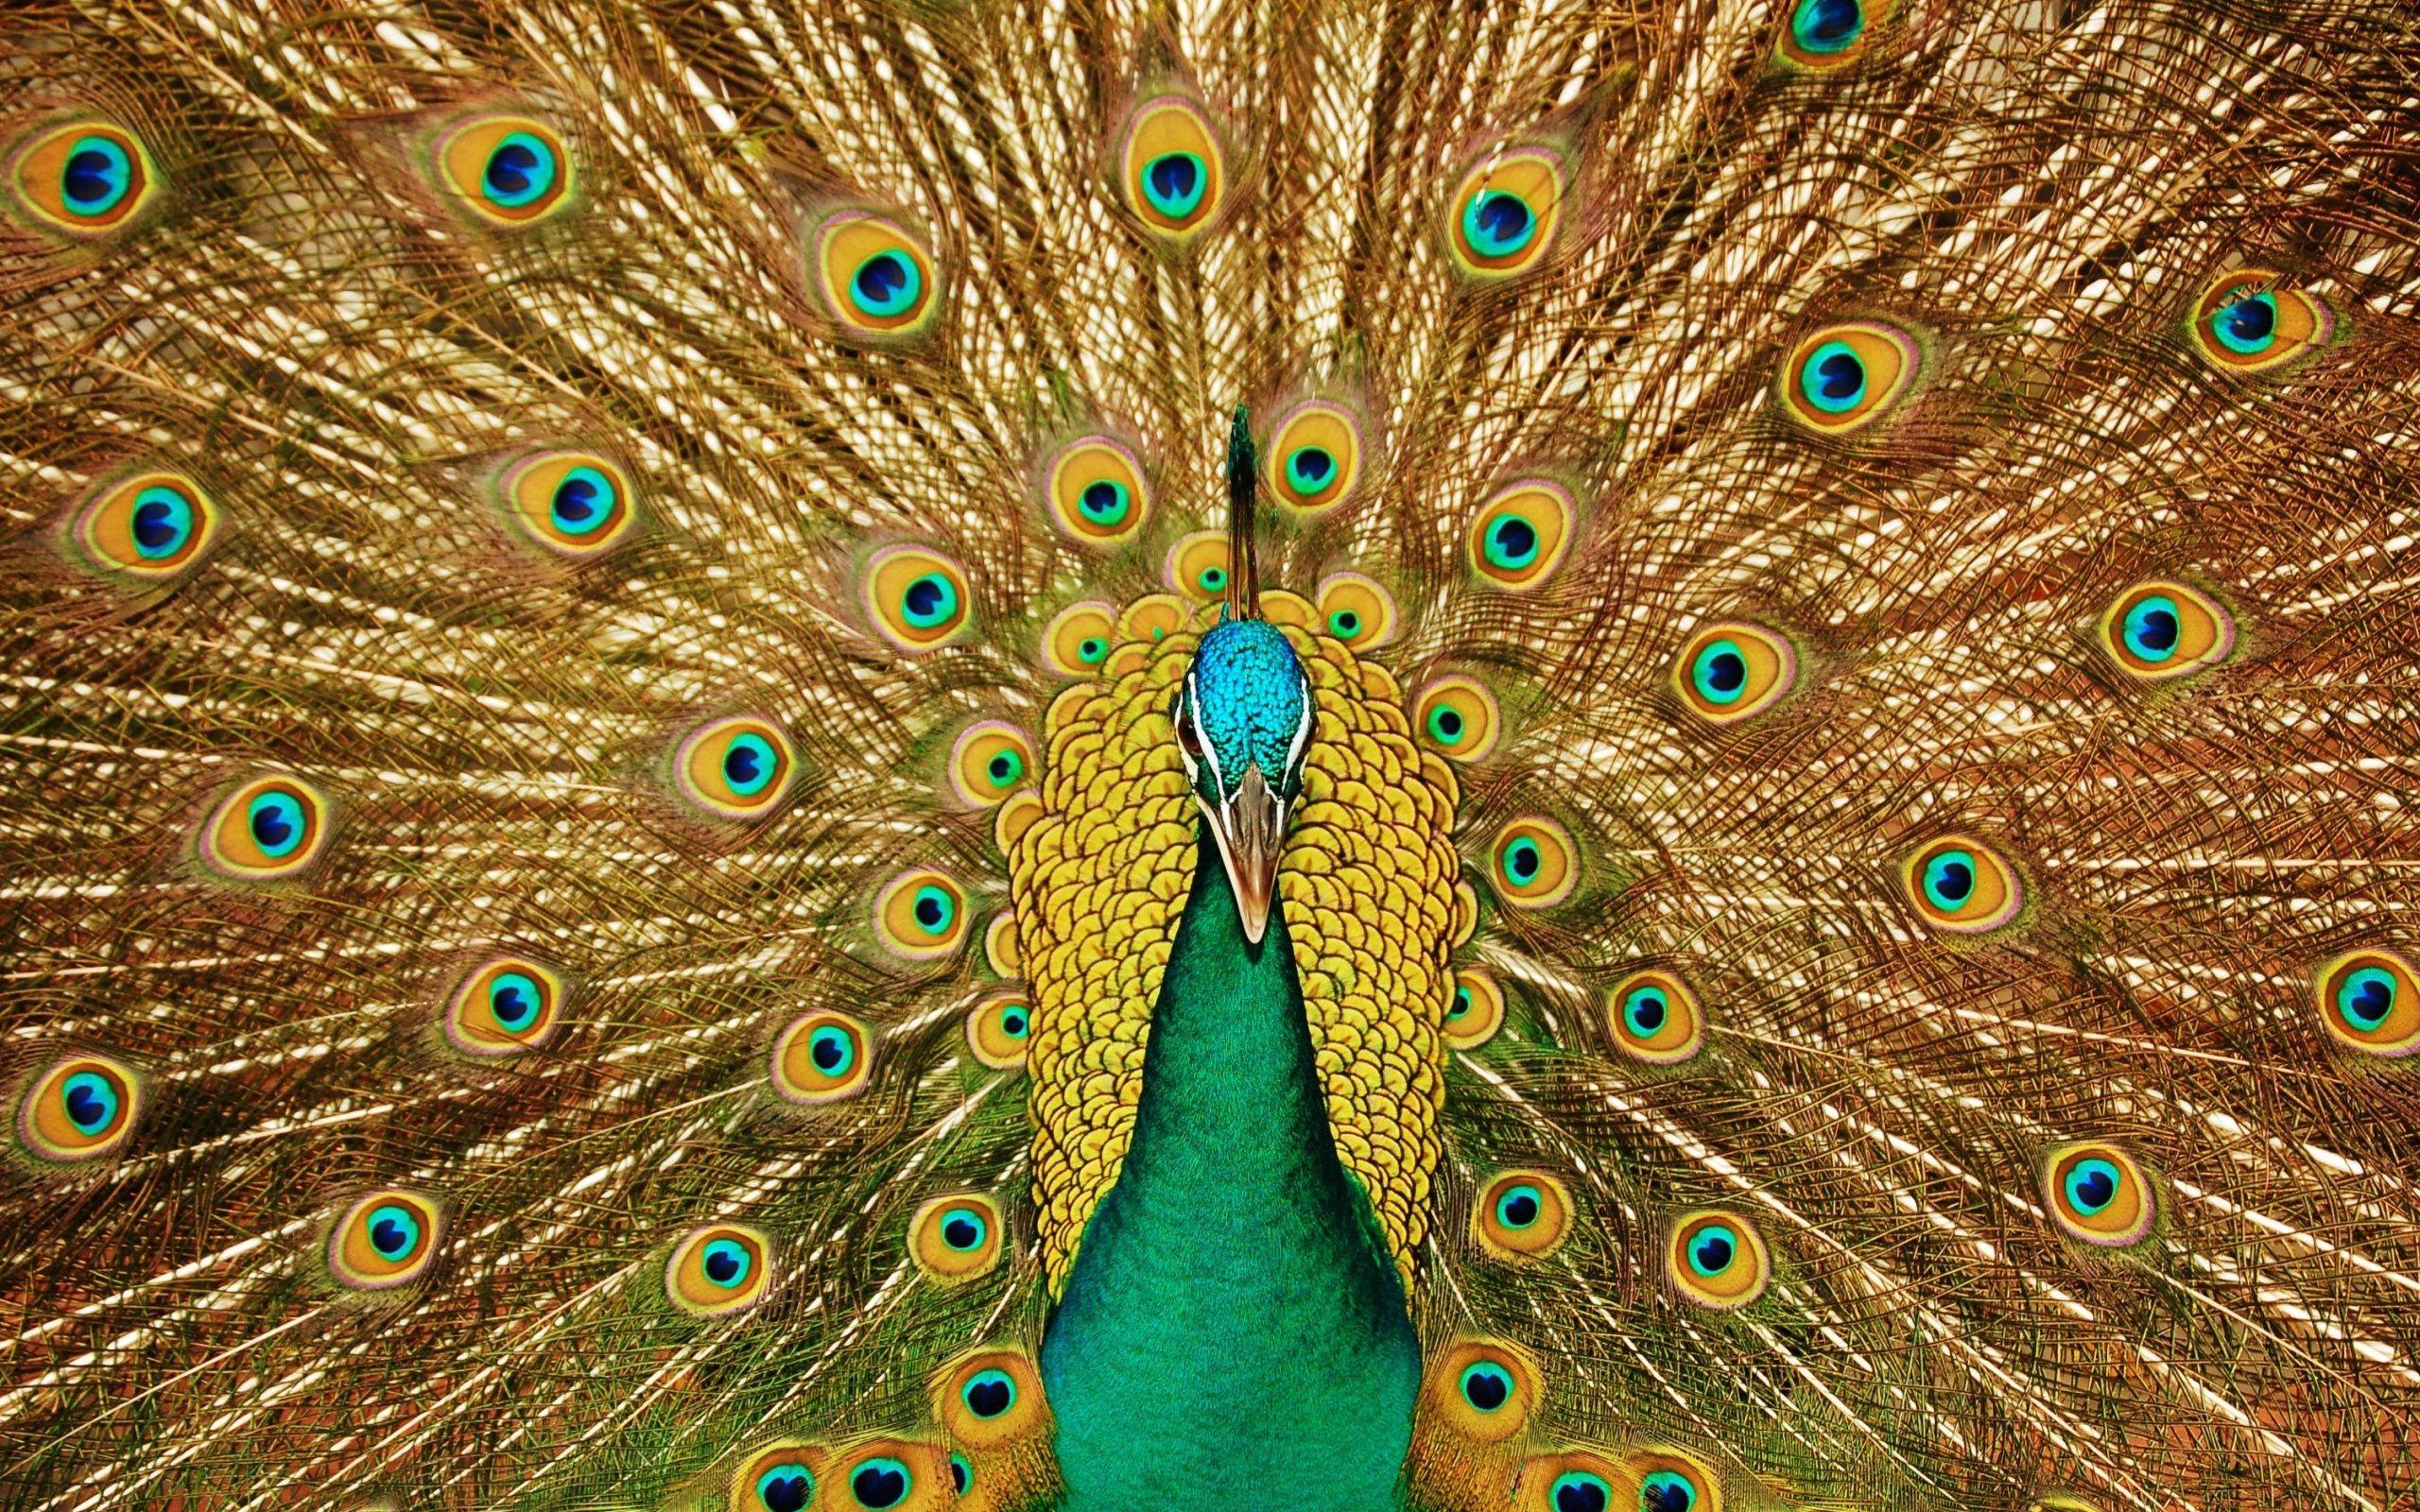 peacock - Google Search | animals | Pinterest | Peacocks, Peacock ...